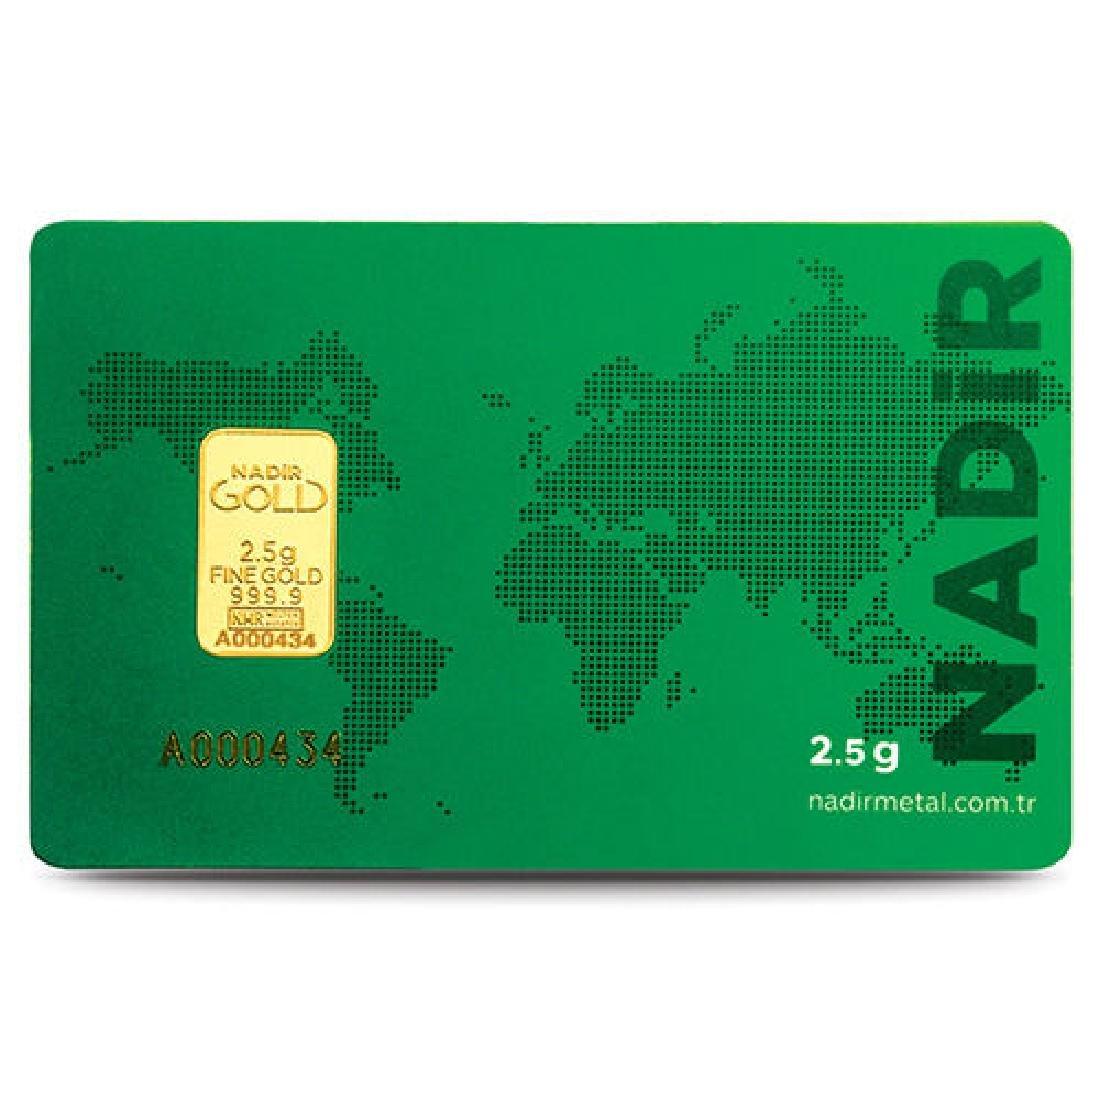 2.5g - 999.9/1000 - Minted/ Sealed Gold Bar - 2